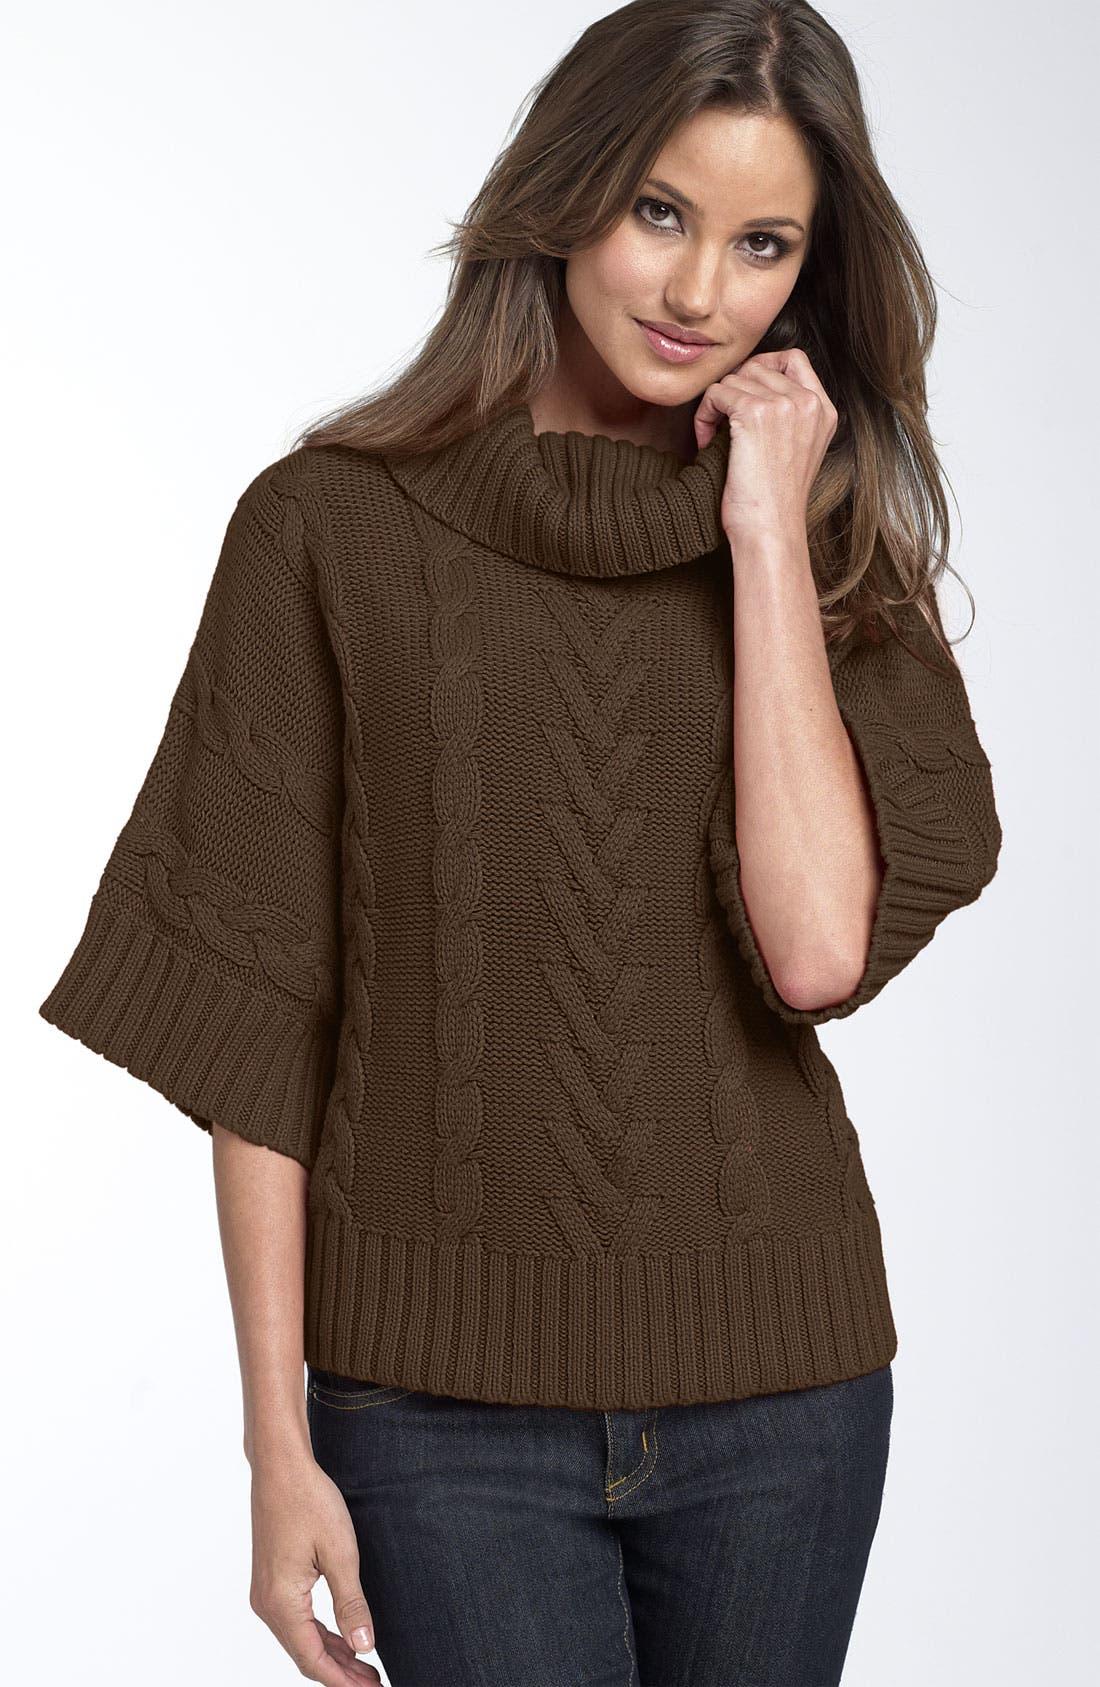 LEO & NICOLE Cowl Neck Sweater, Main, color, 275